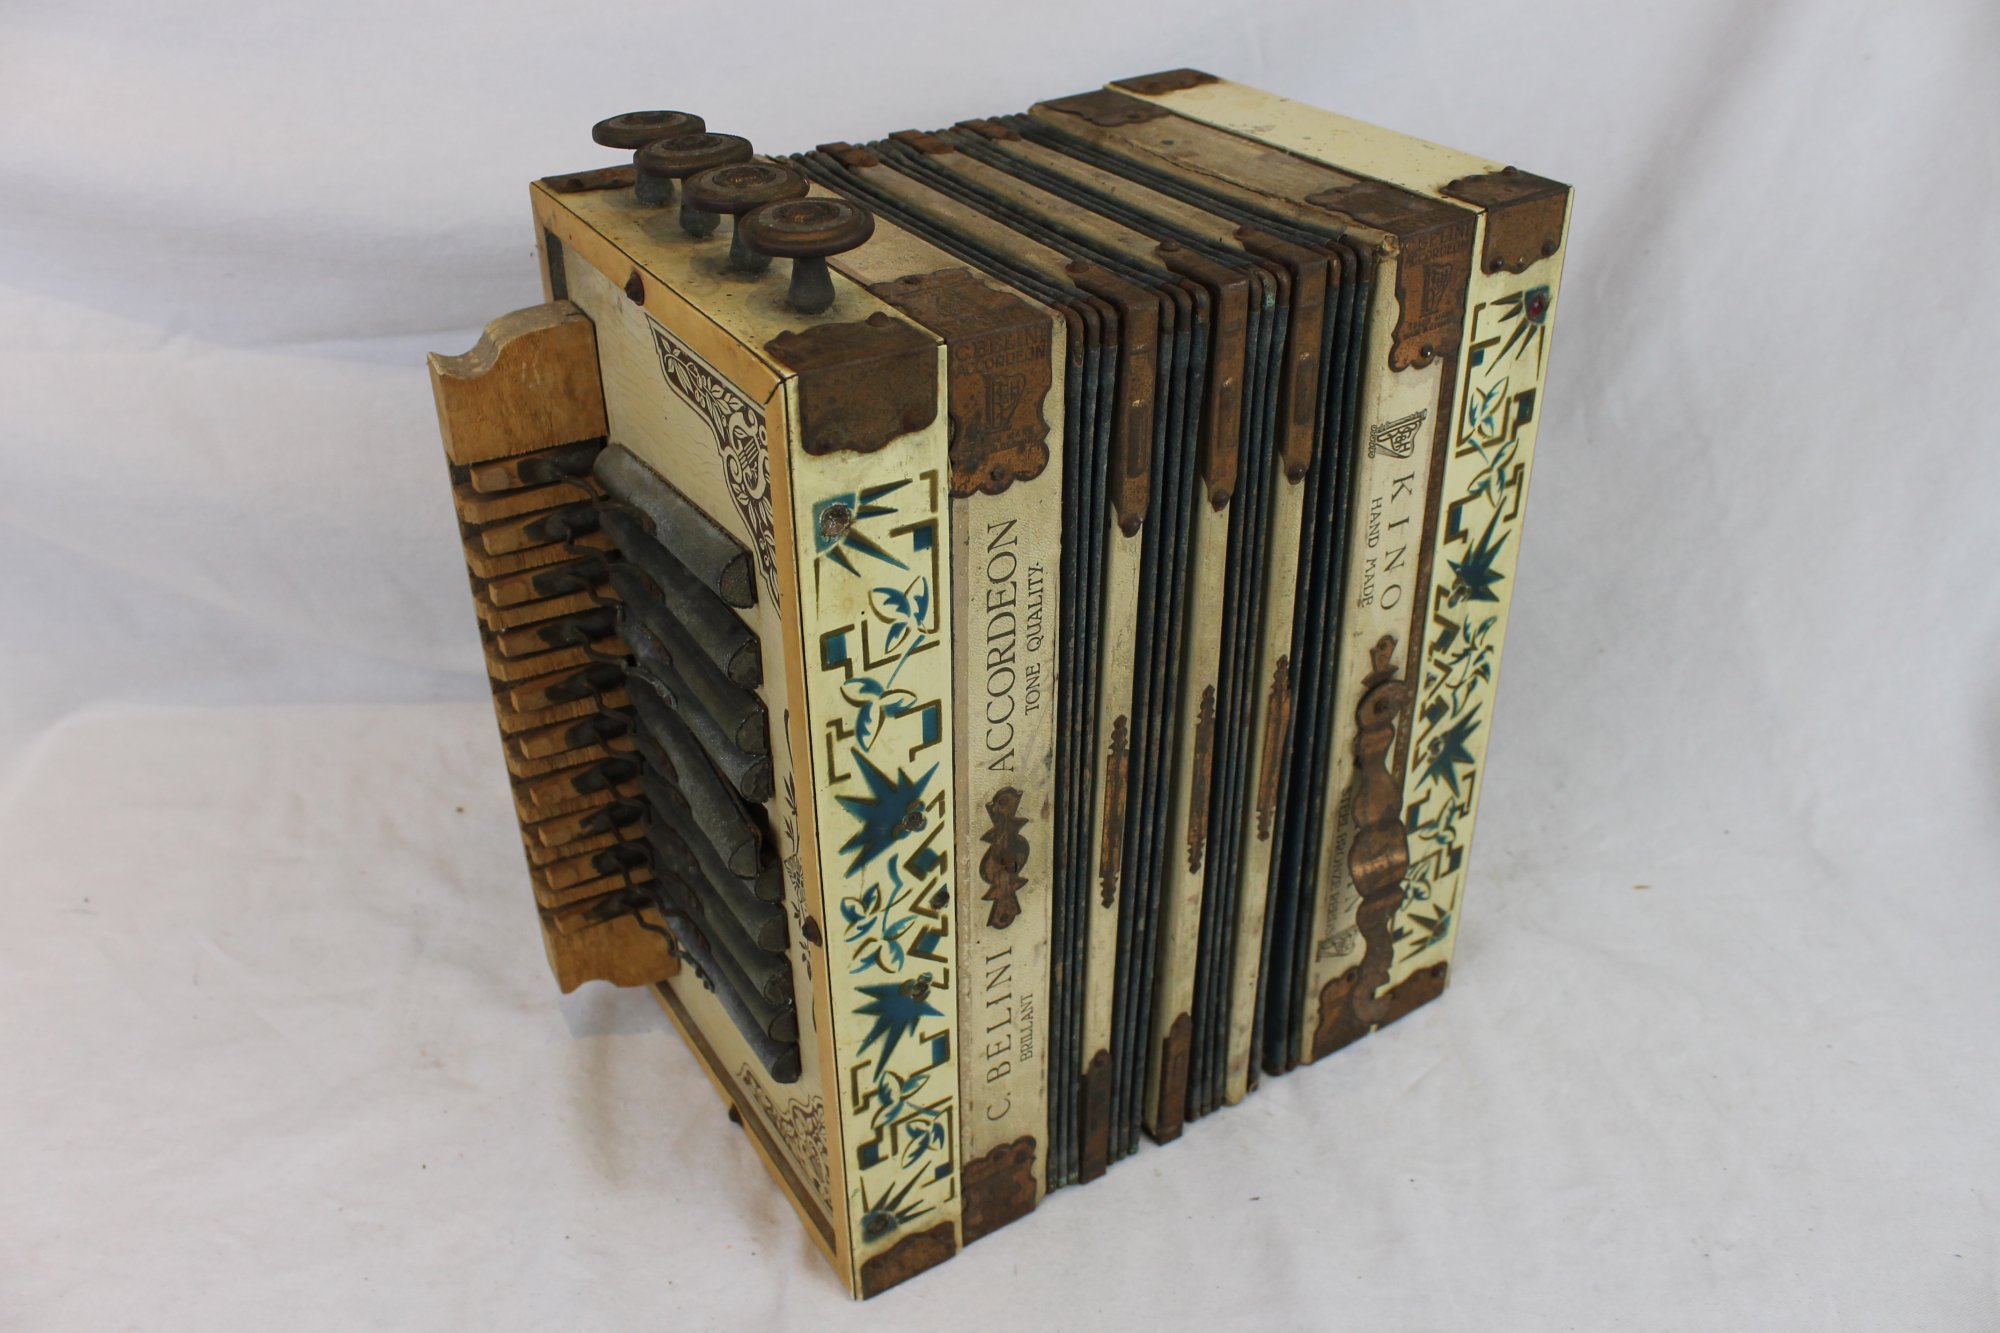 3960 - Cream C. Belini Kino Organ Diatonic Button Accordion - For Parts or Repair